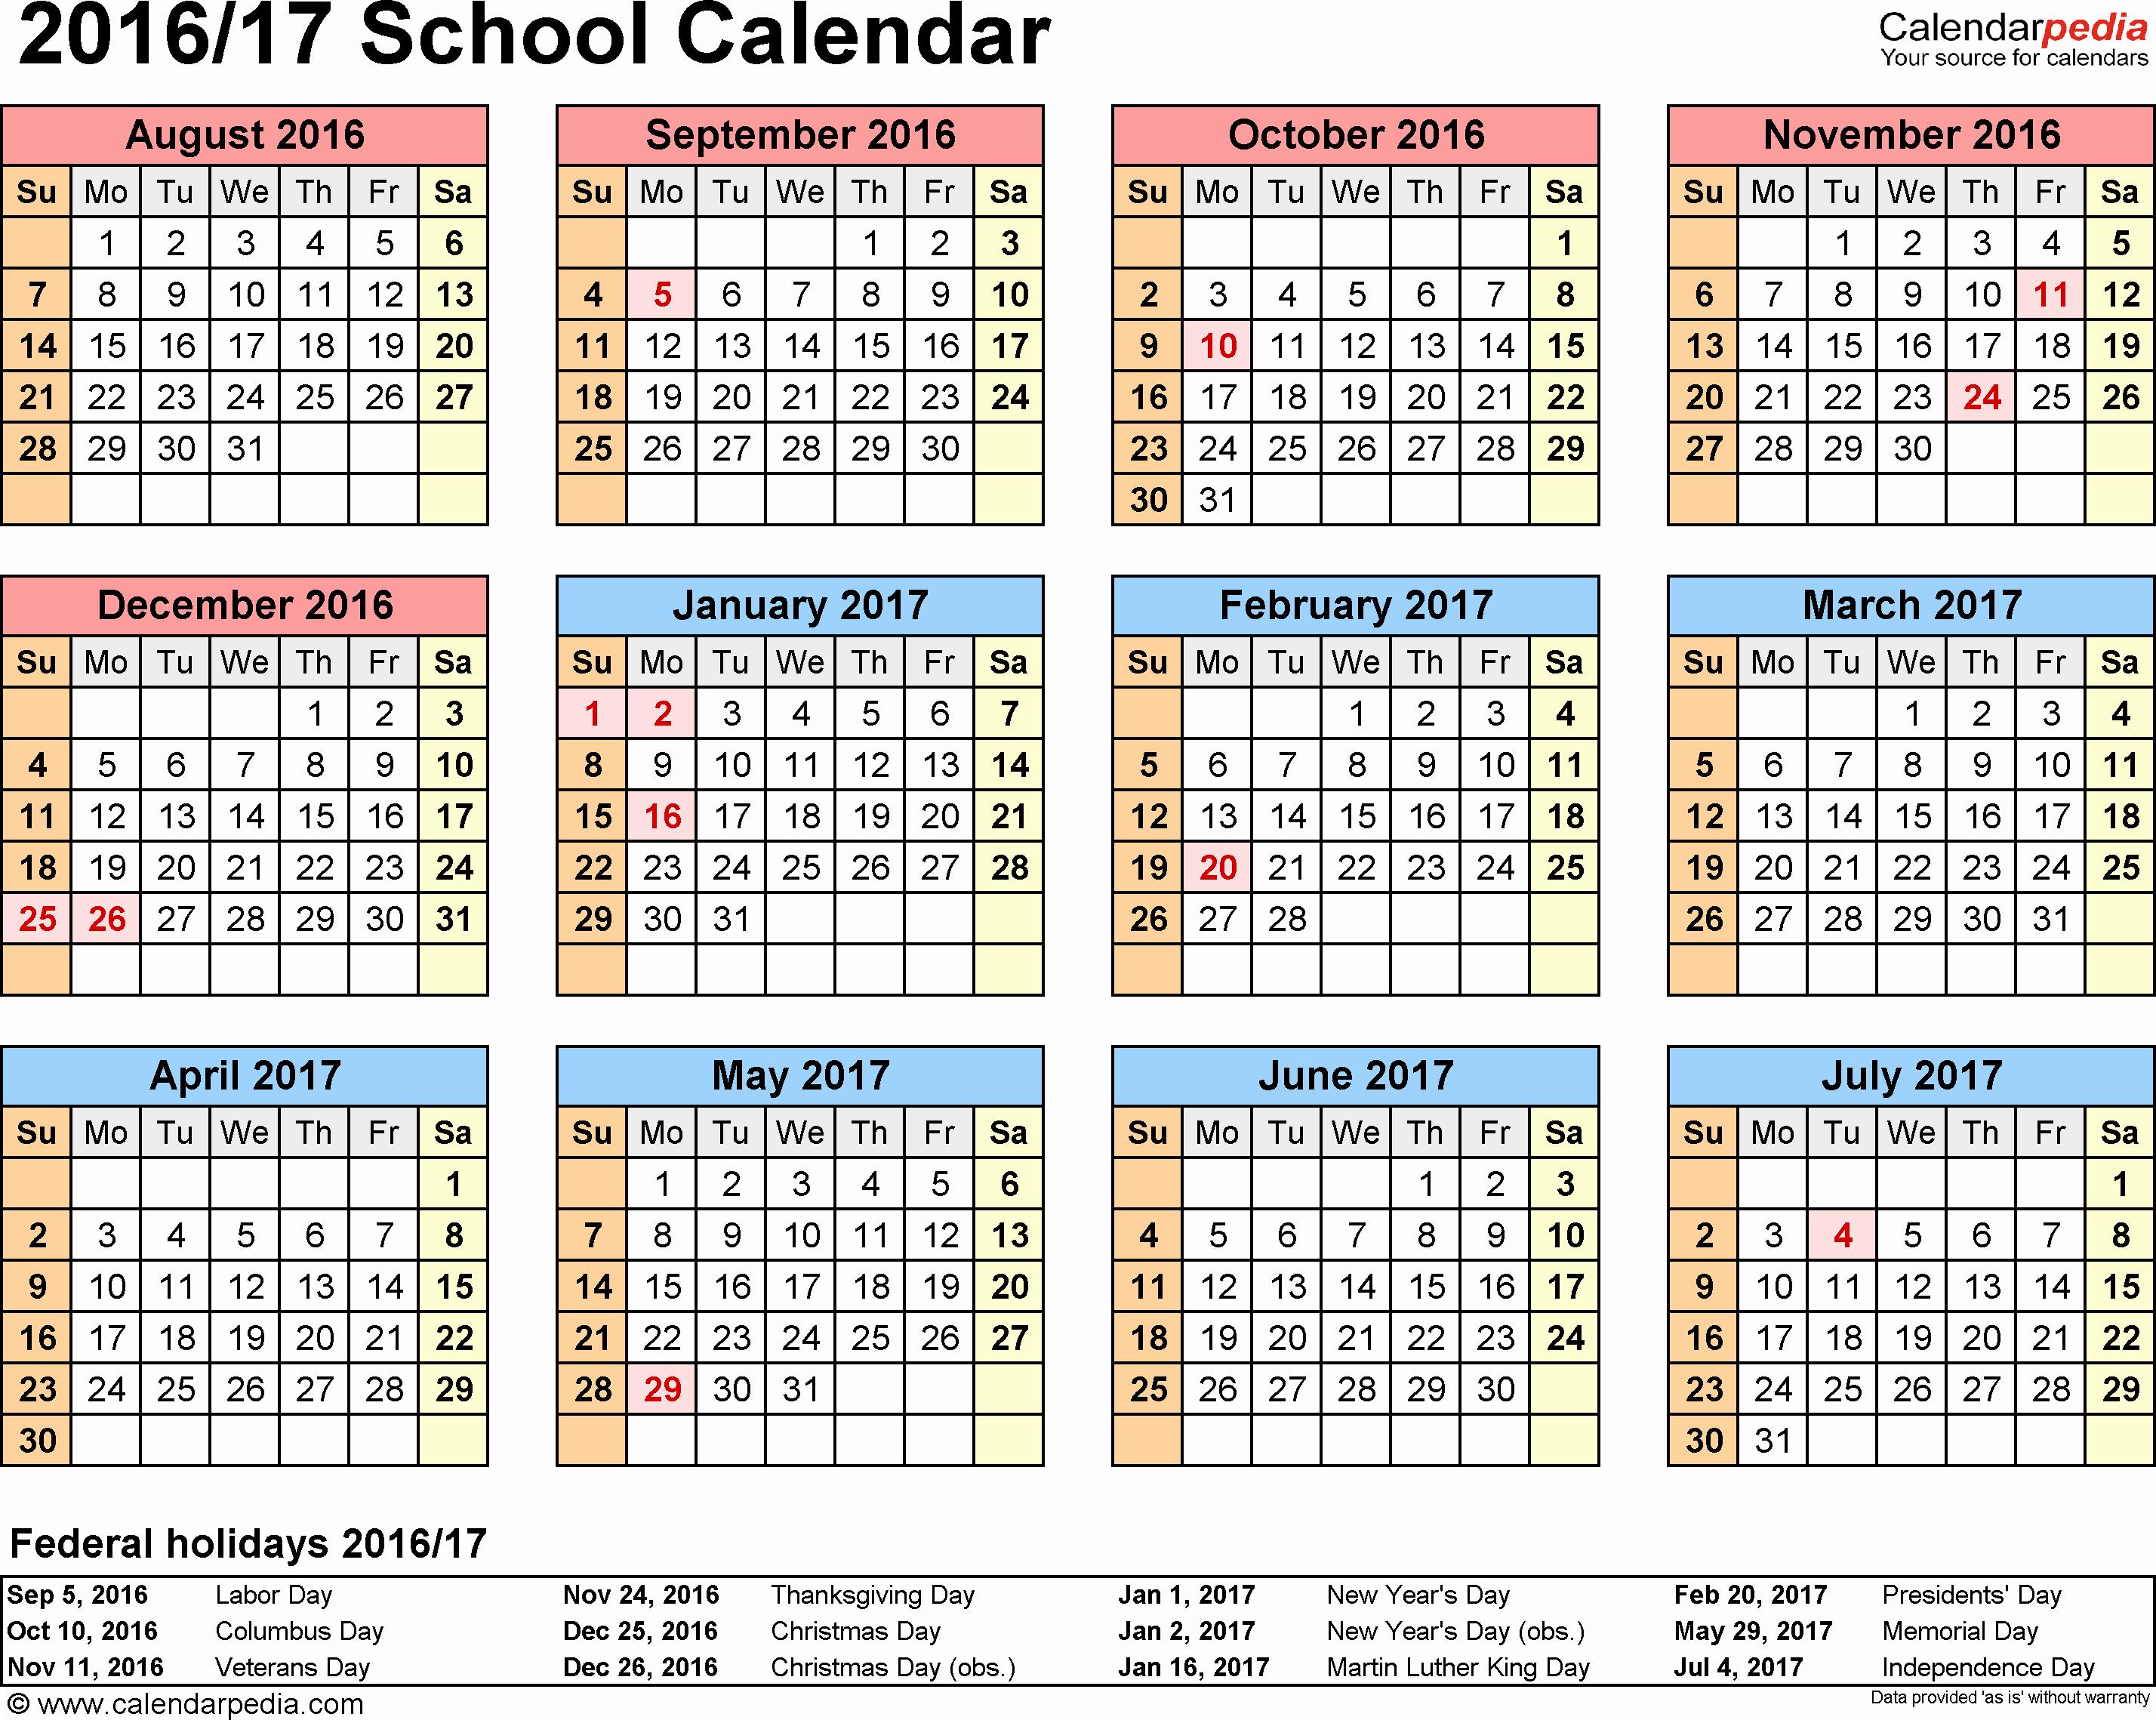 2016 2017 School Calendar Template Beautiful School Calendars 2016 2017 as Free Printable Word Templates